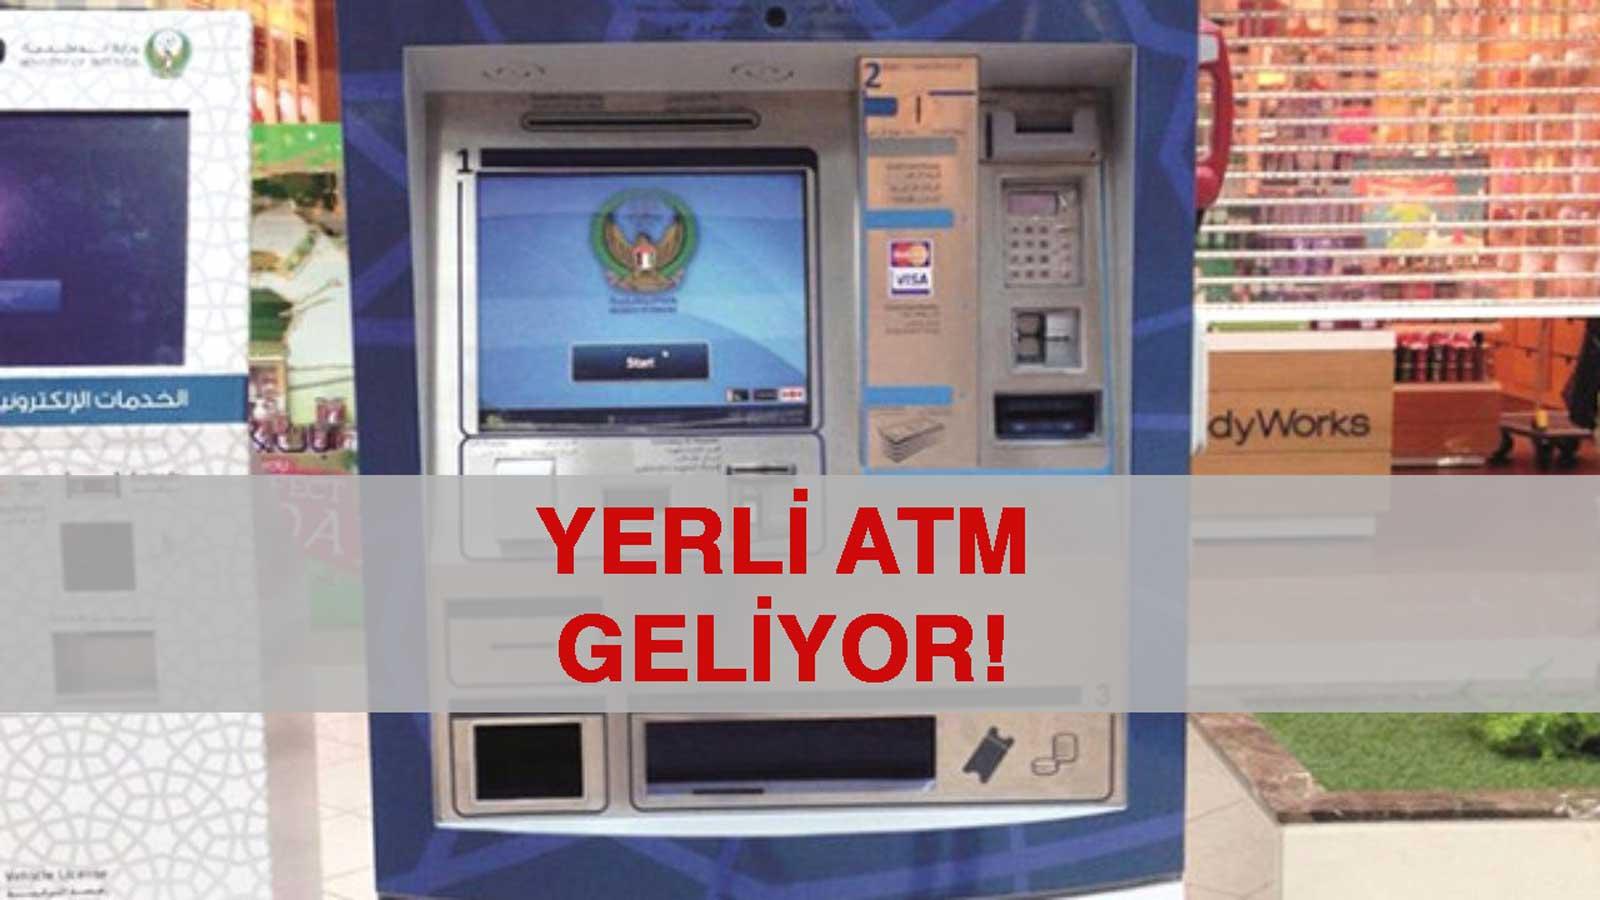 Yerli ATM